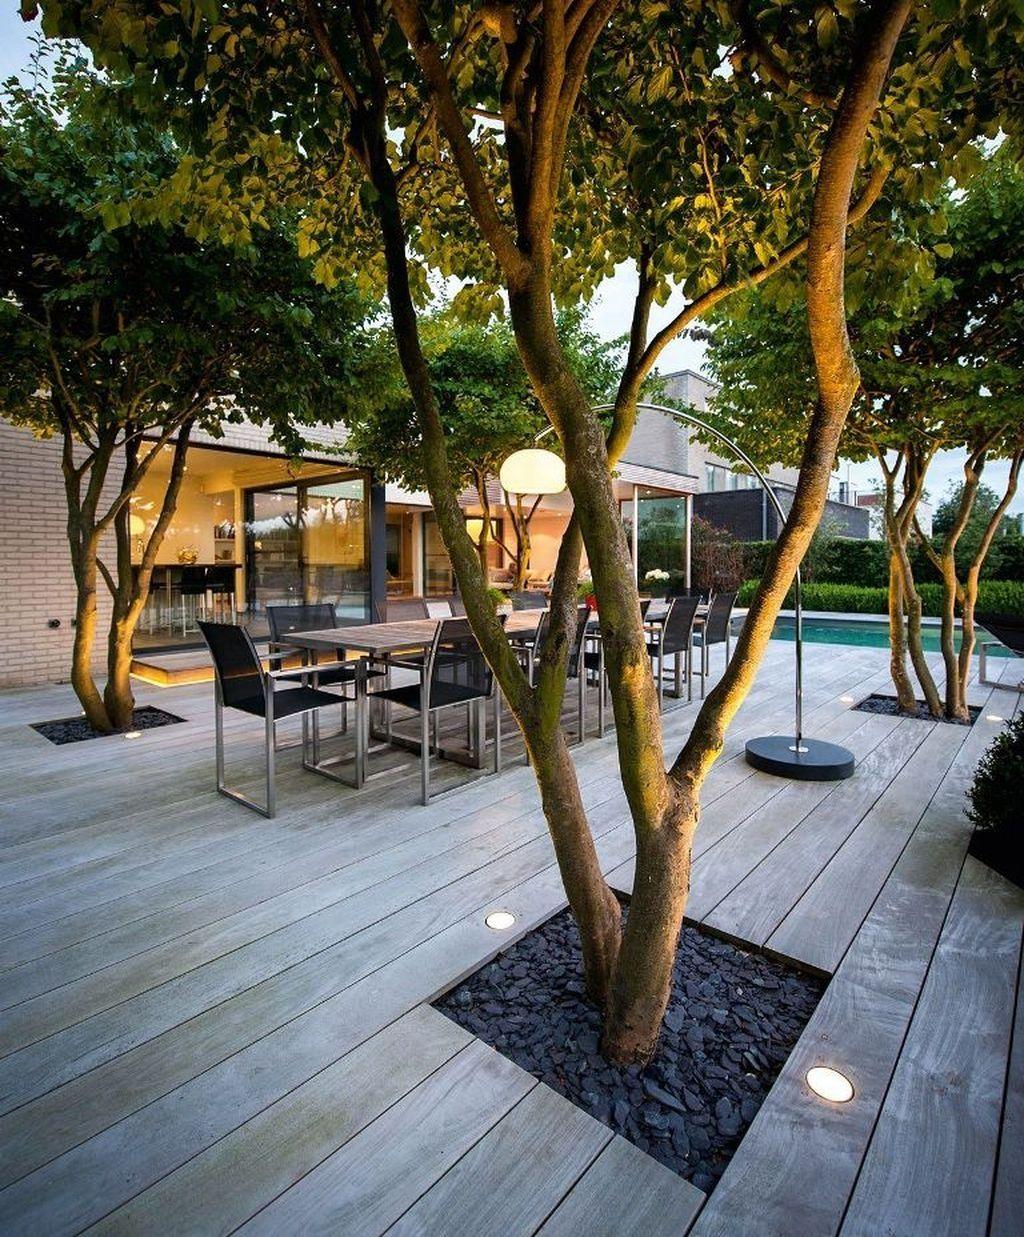 38 Relaxing Terrace Garden Design Ideas With Lighting -   13 garden design Inspiration indoor herbs ideas